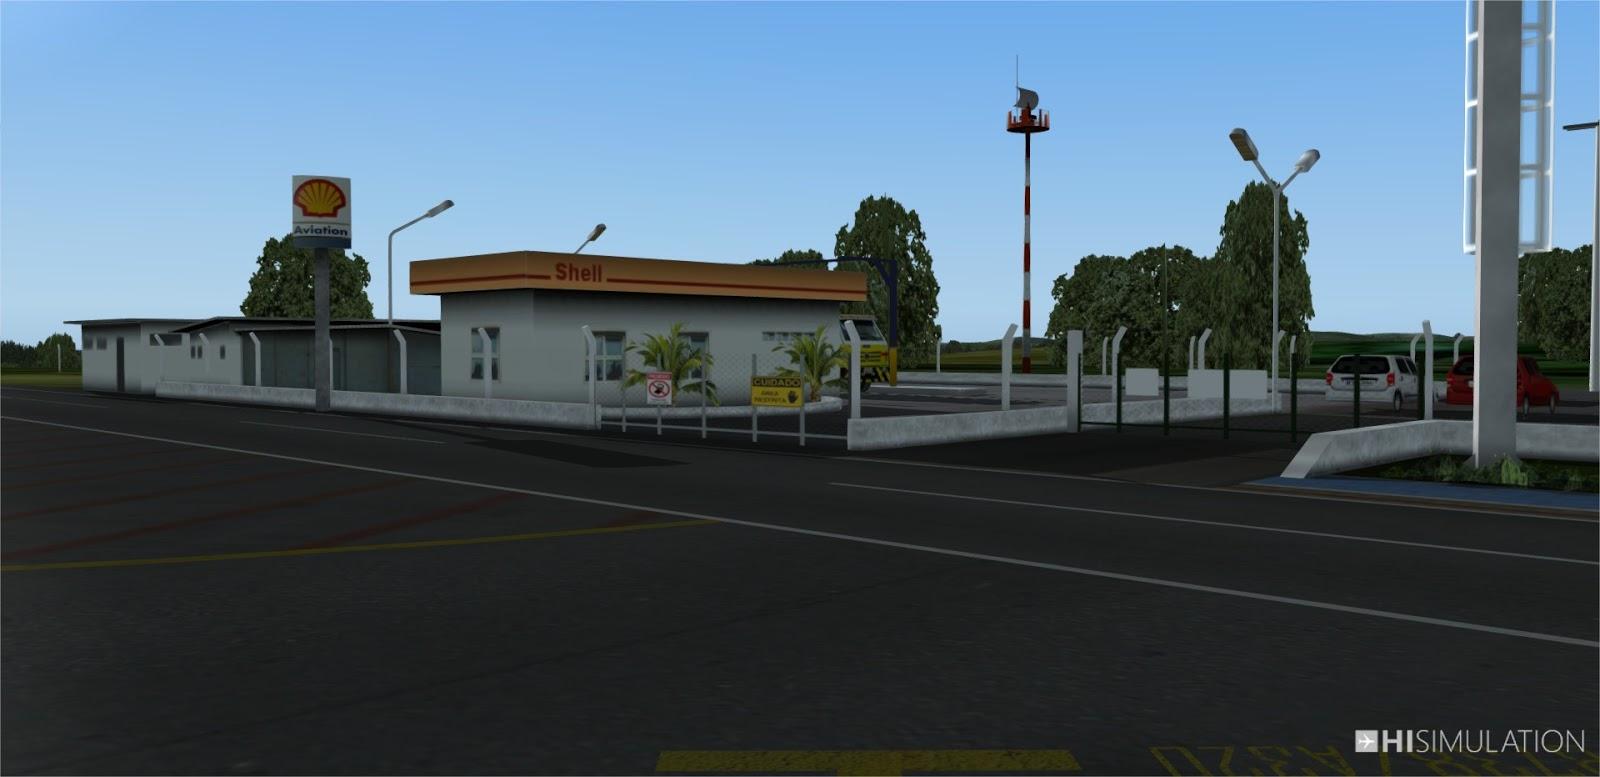 [Loja] SBCHX2018 - Aeroporto de Chapecó FSX, Prepar3D vs 3, 4